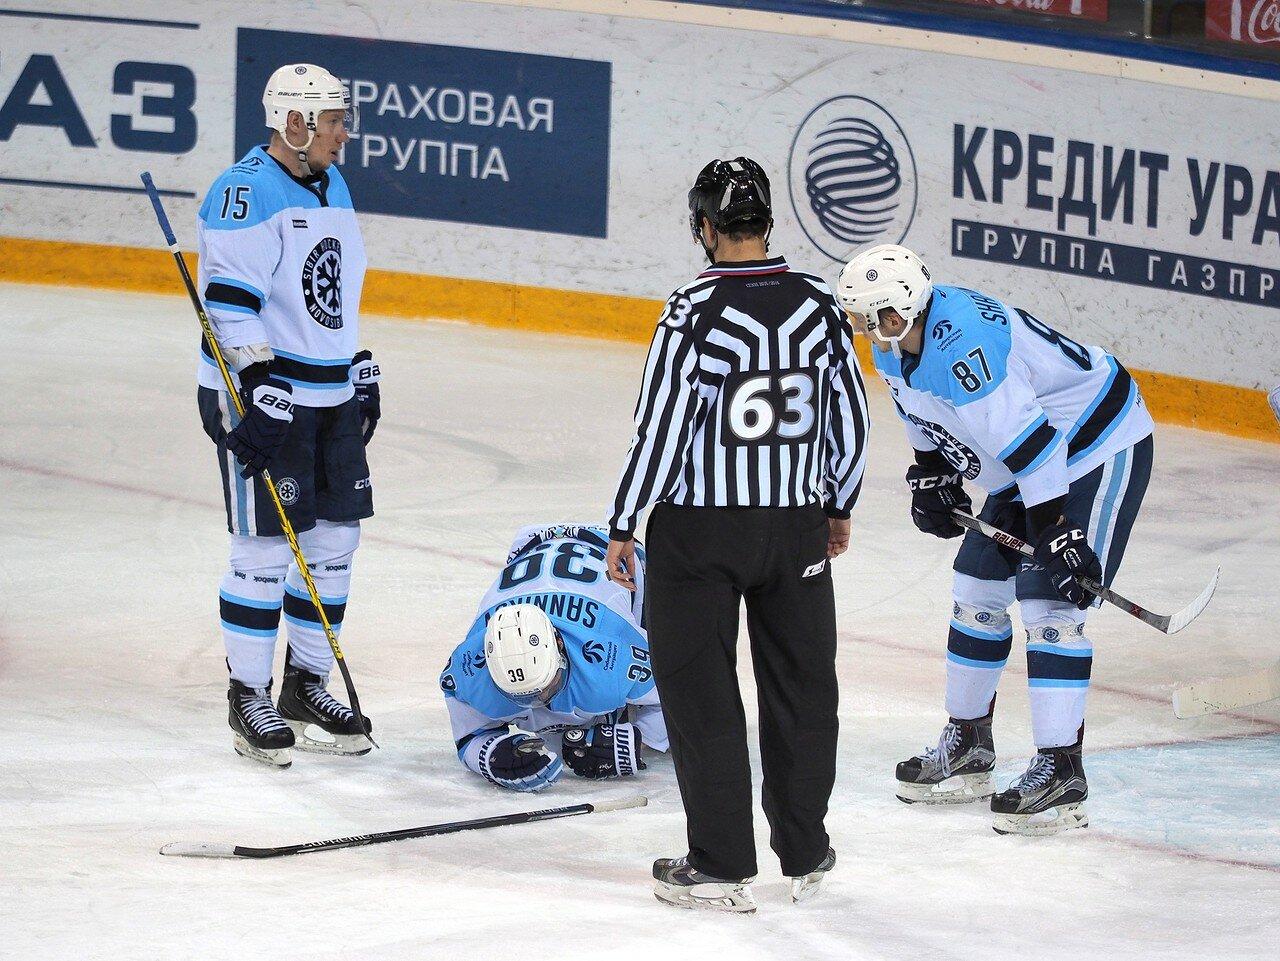 86Восток 1/2 плей-офф Металлург - Сибирь 08.03.2016